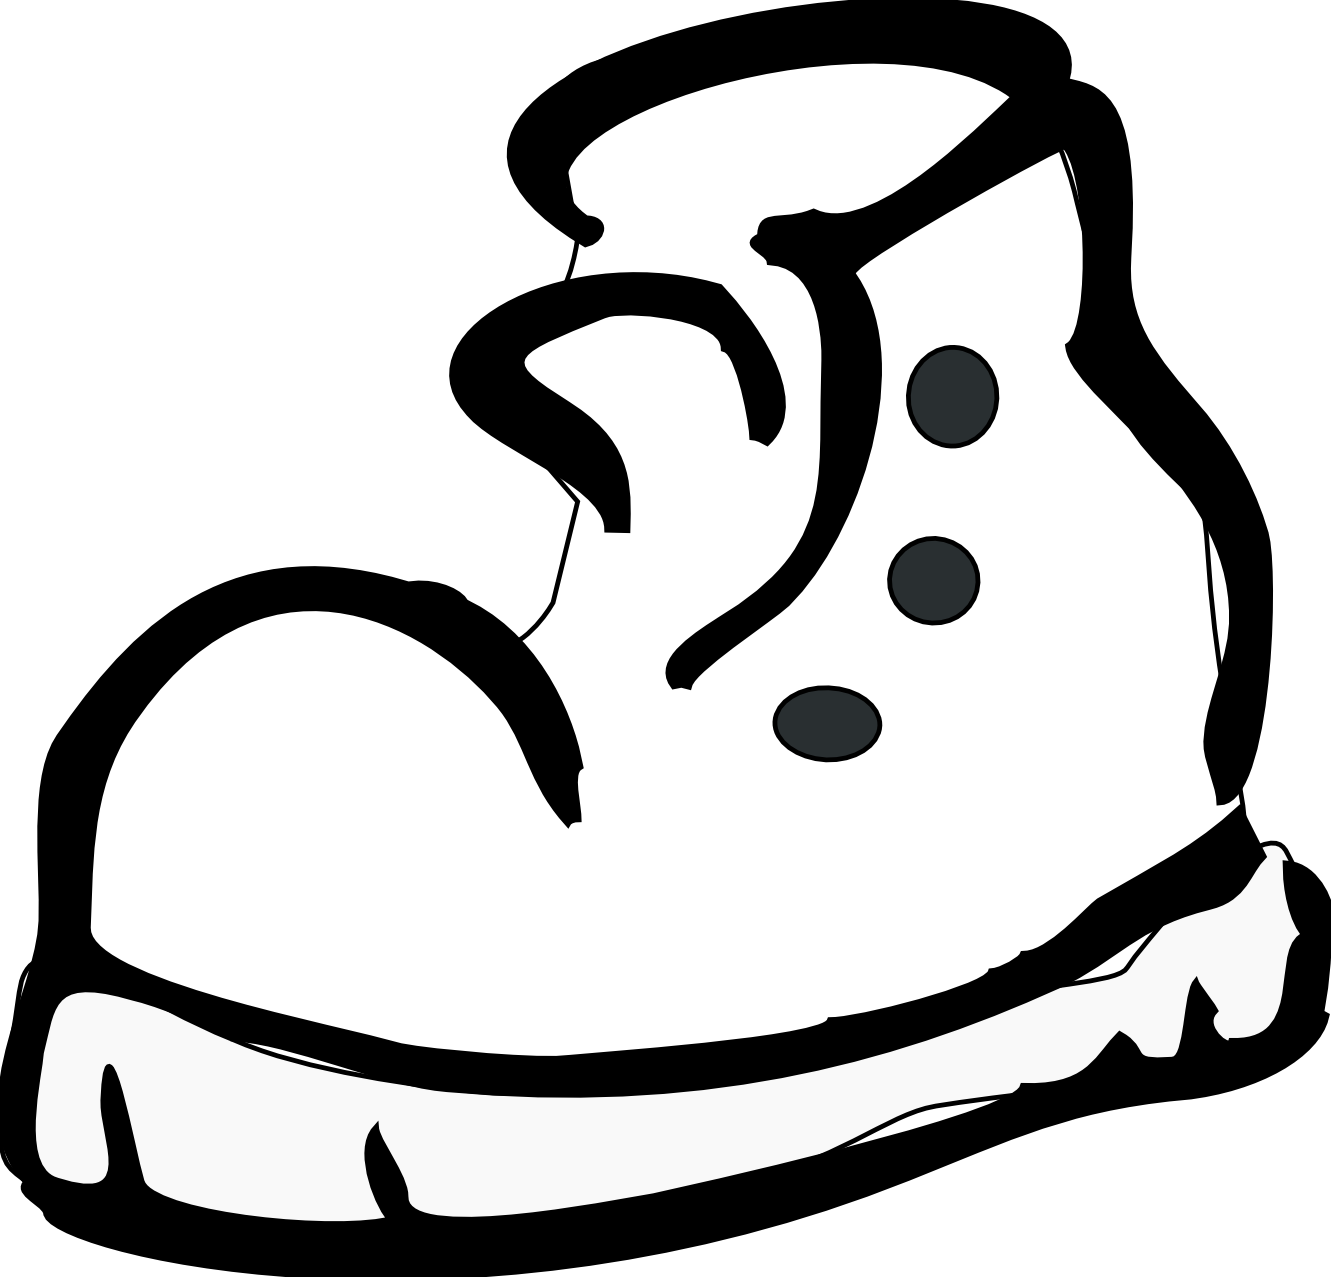 1331x1277 Top 67 Shoe Clip Art